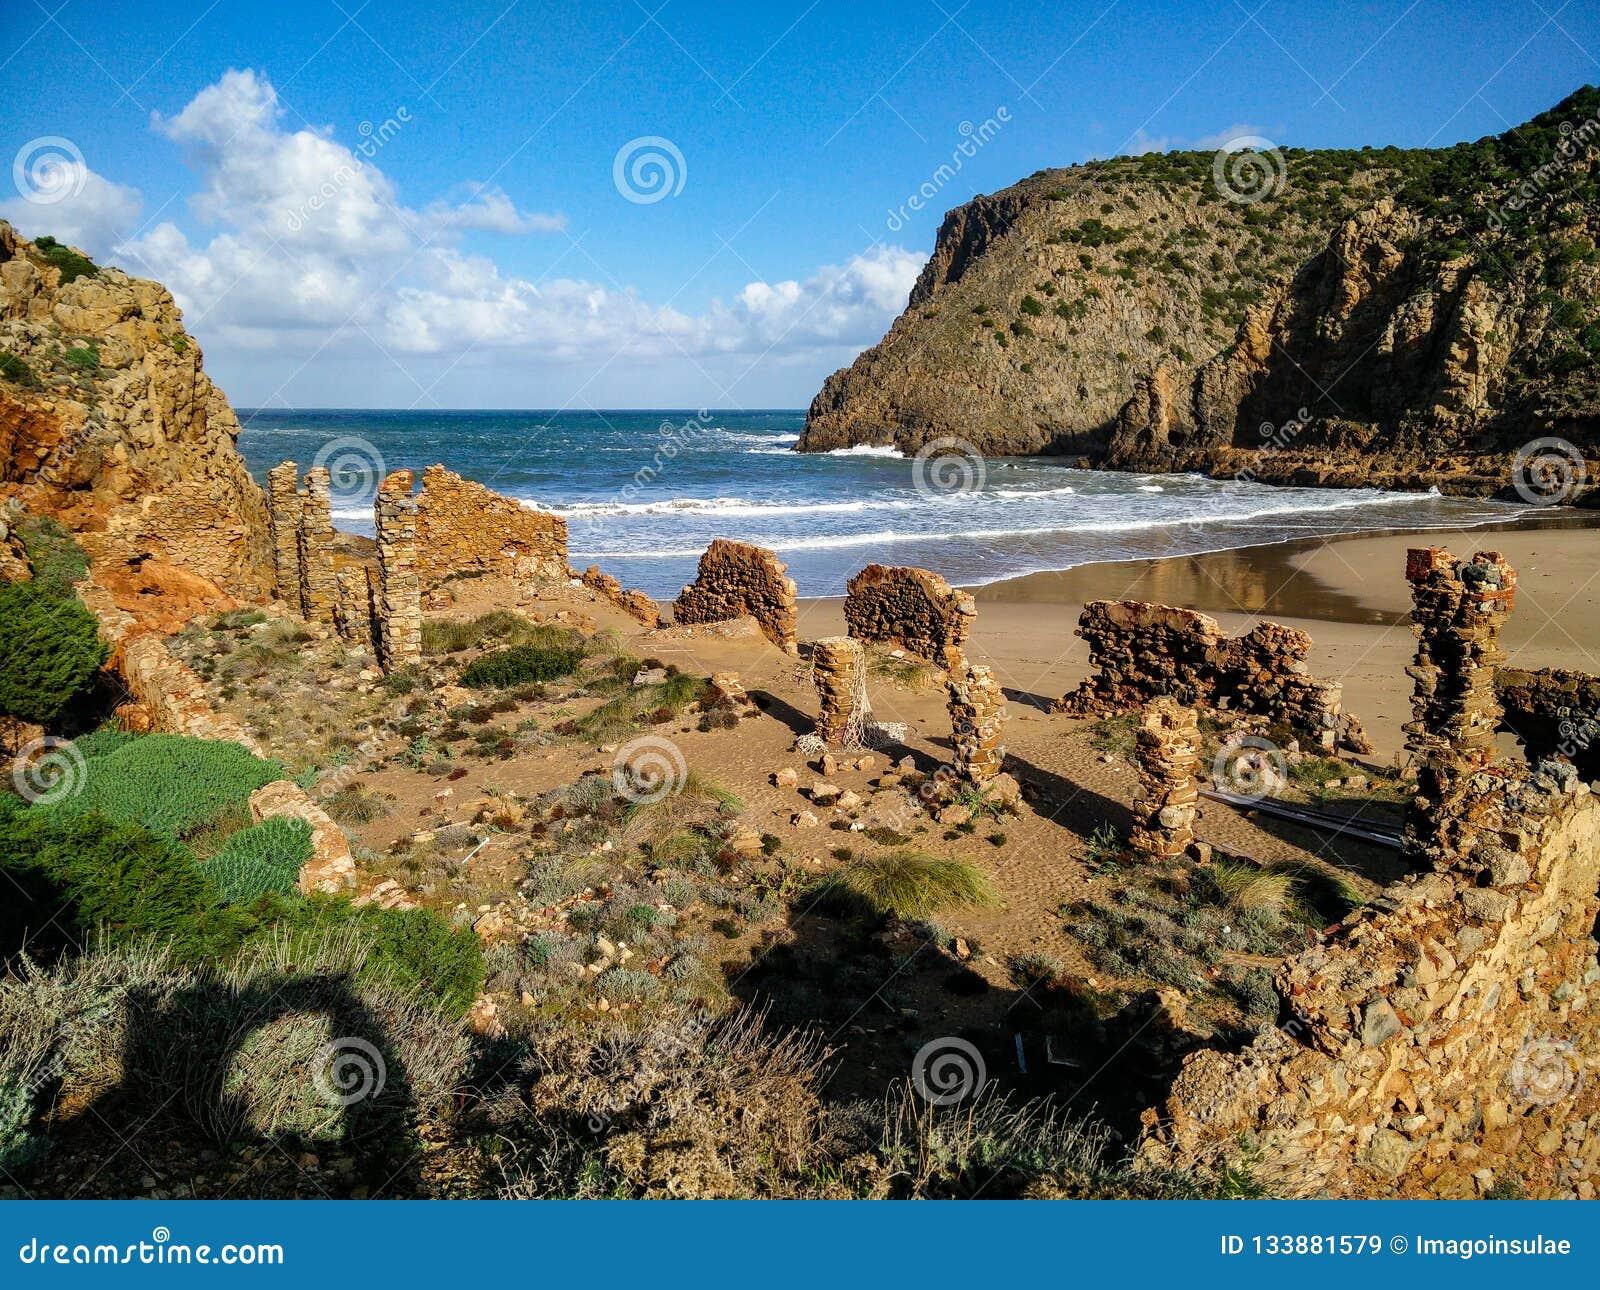 Sardinia. Coastal landscapes